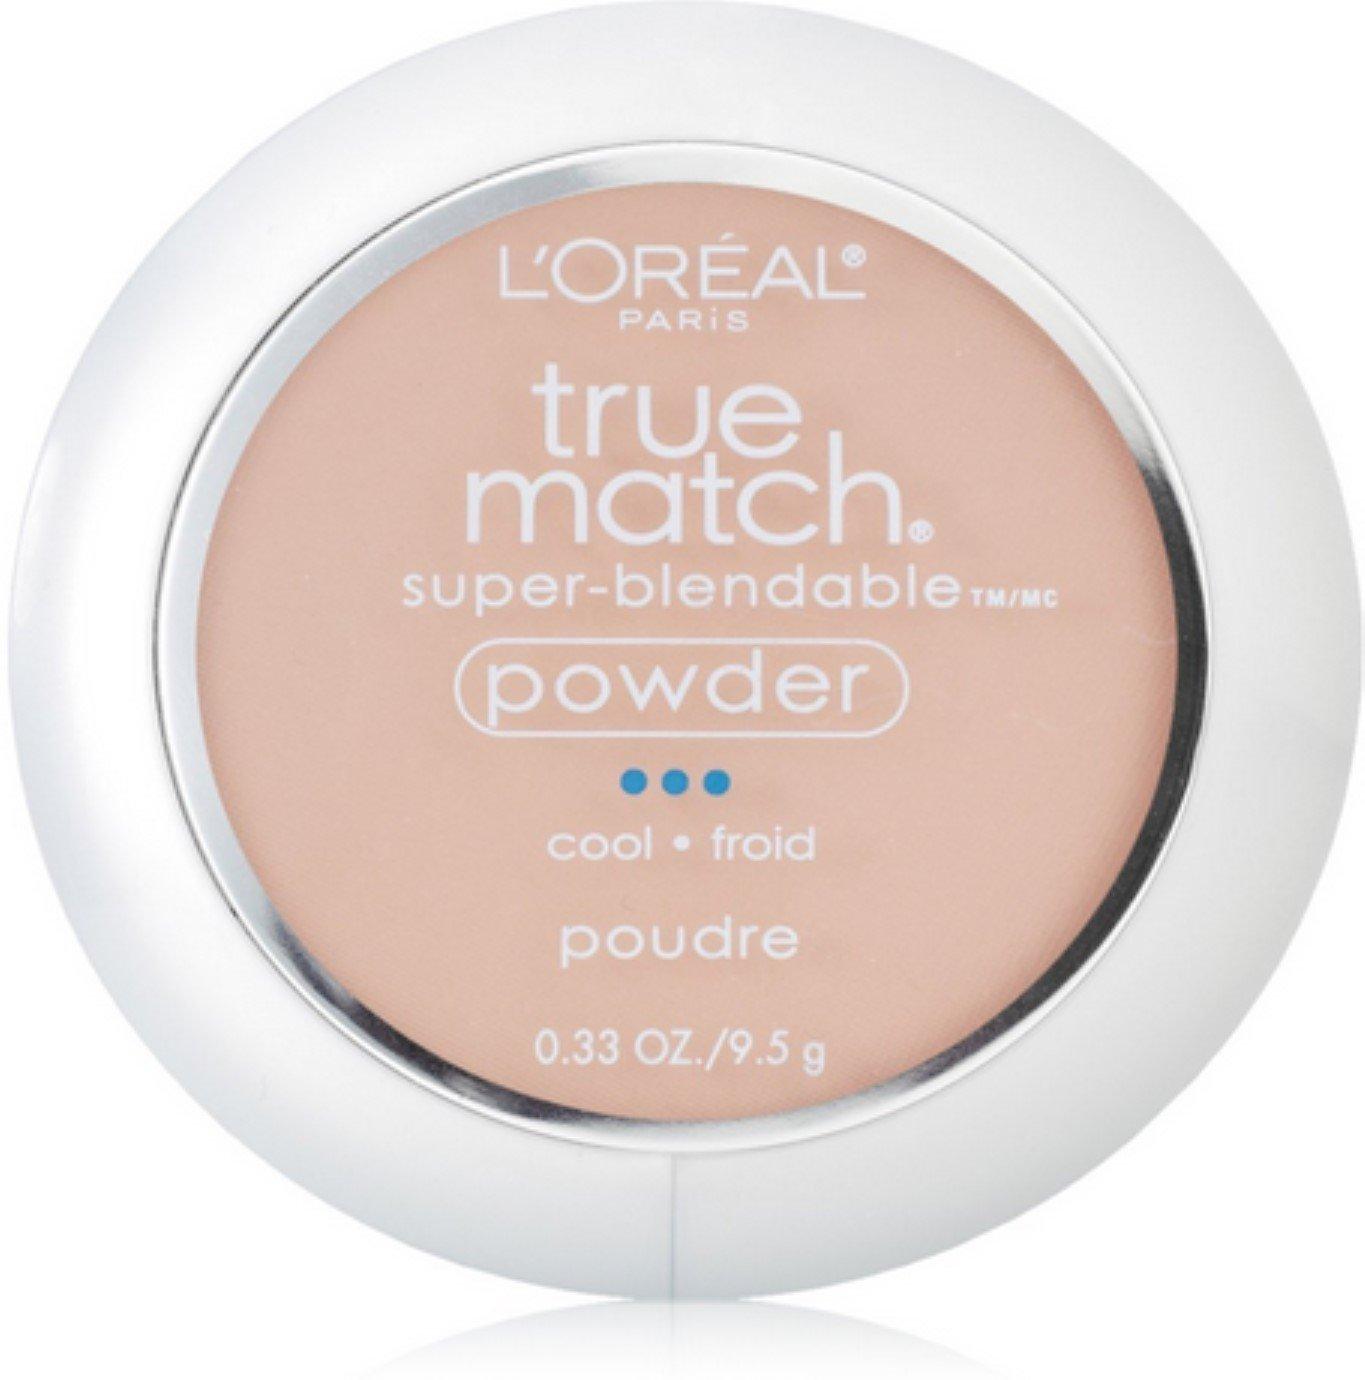 L'Oreal True Match Powder, Shell Beige [C4], 0.33 oz (Pack of 2)